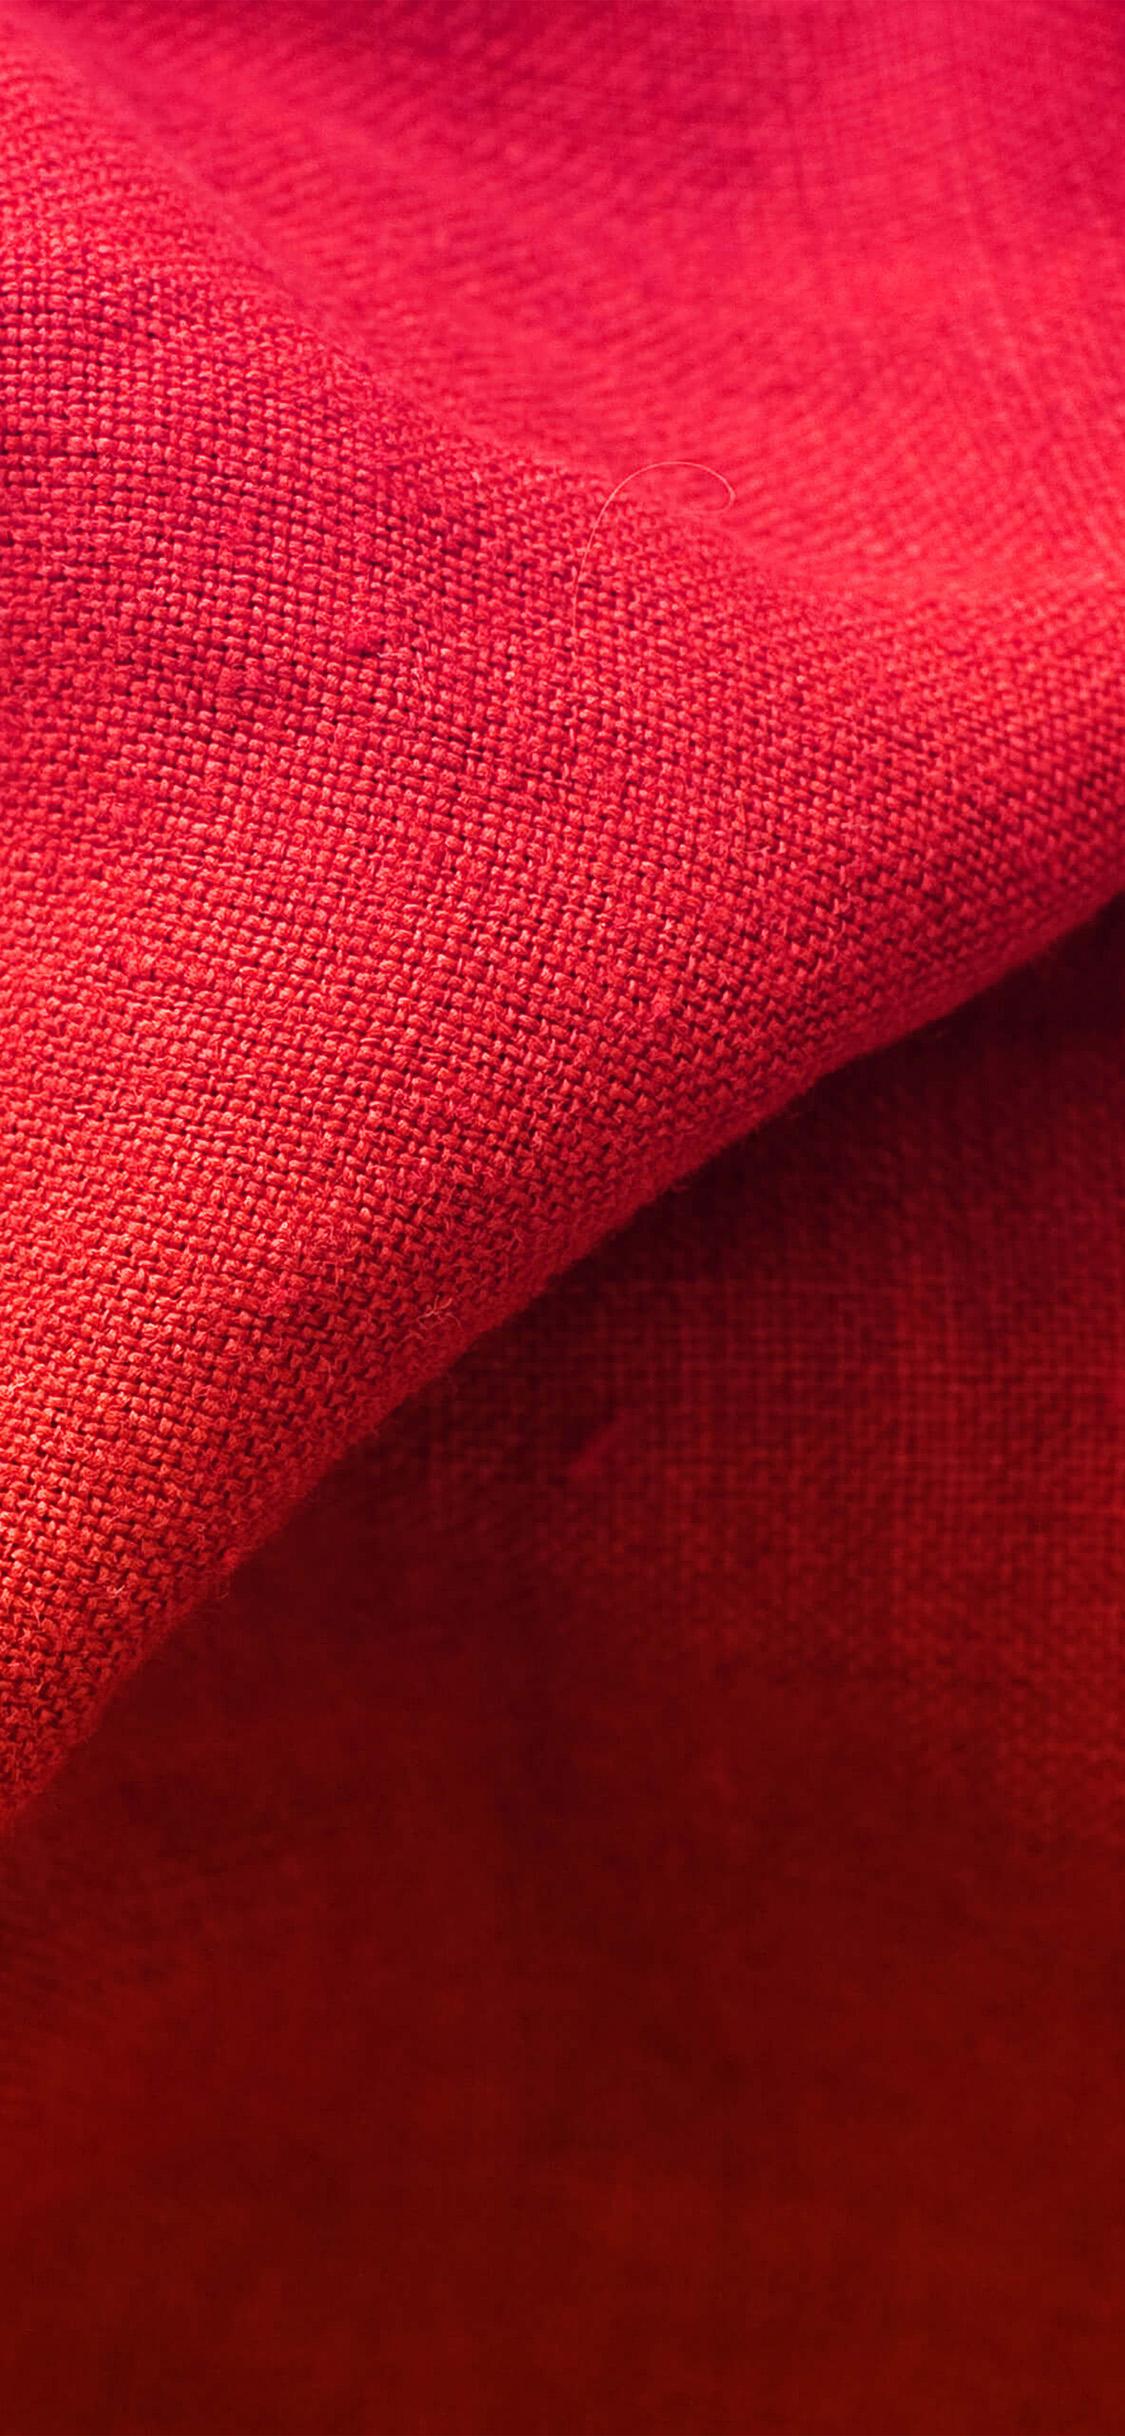 Iphonexpapers Com Iphone X Wallpaper Vz41 Fabric Red